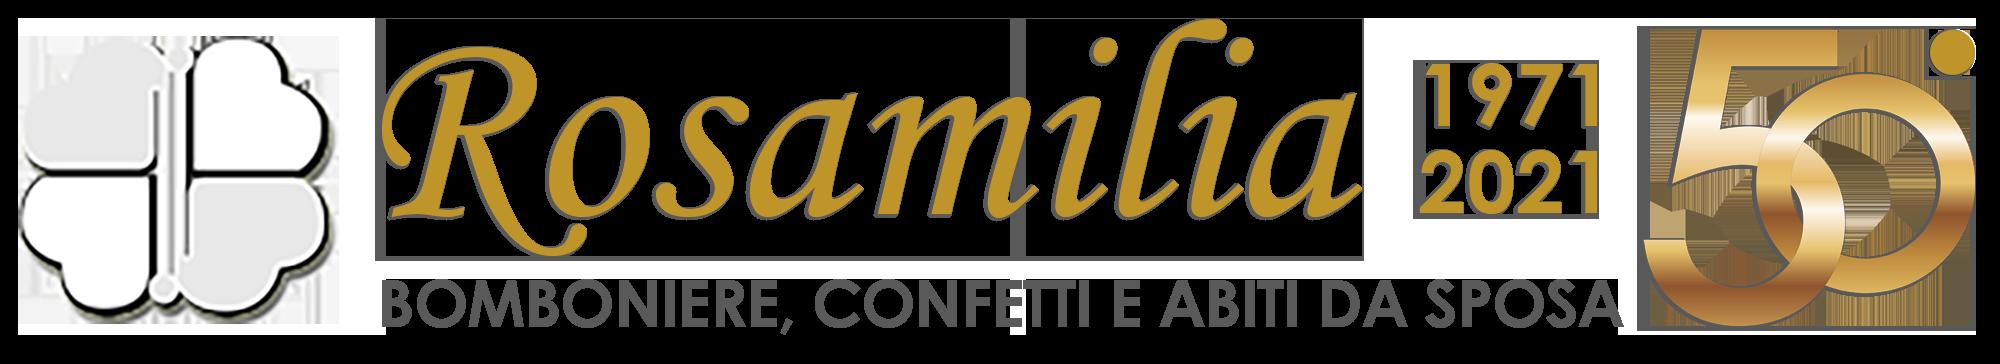 Bomboniere Rosamilia